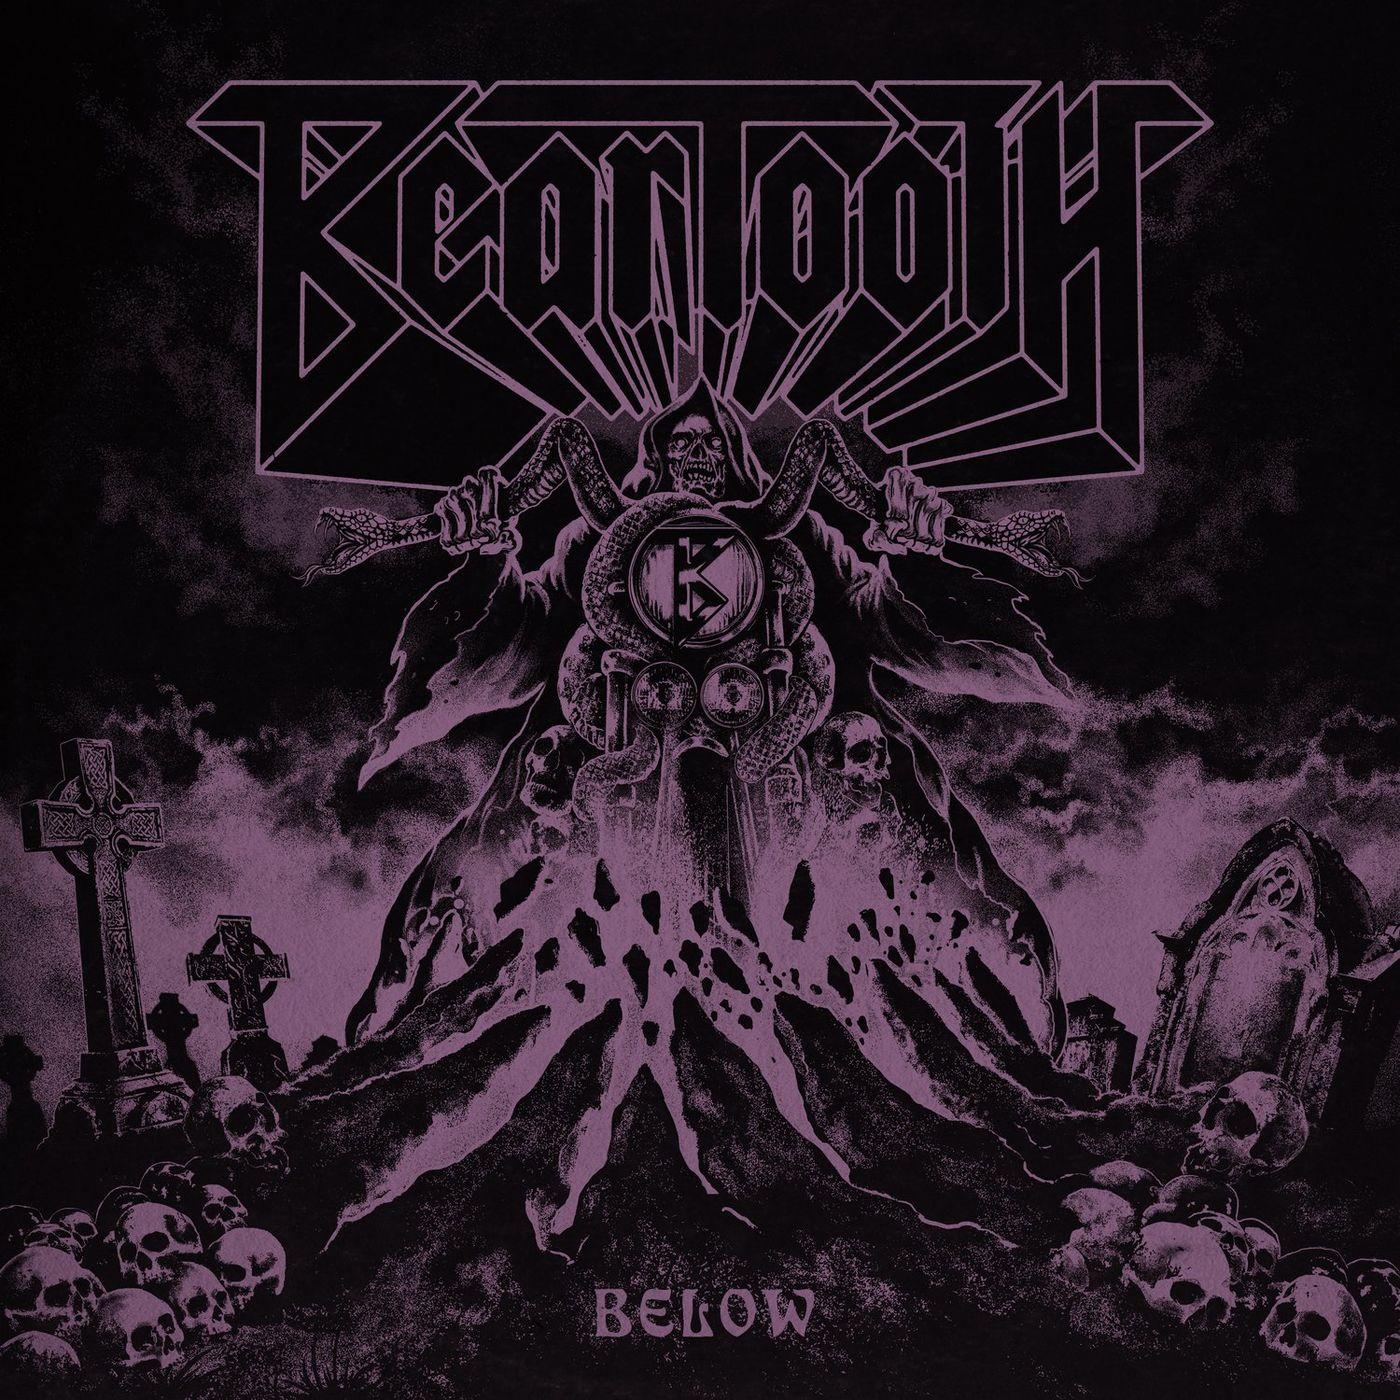 Beartooth - Hell Of It [single] (2021)